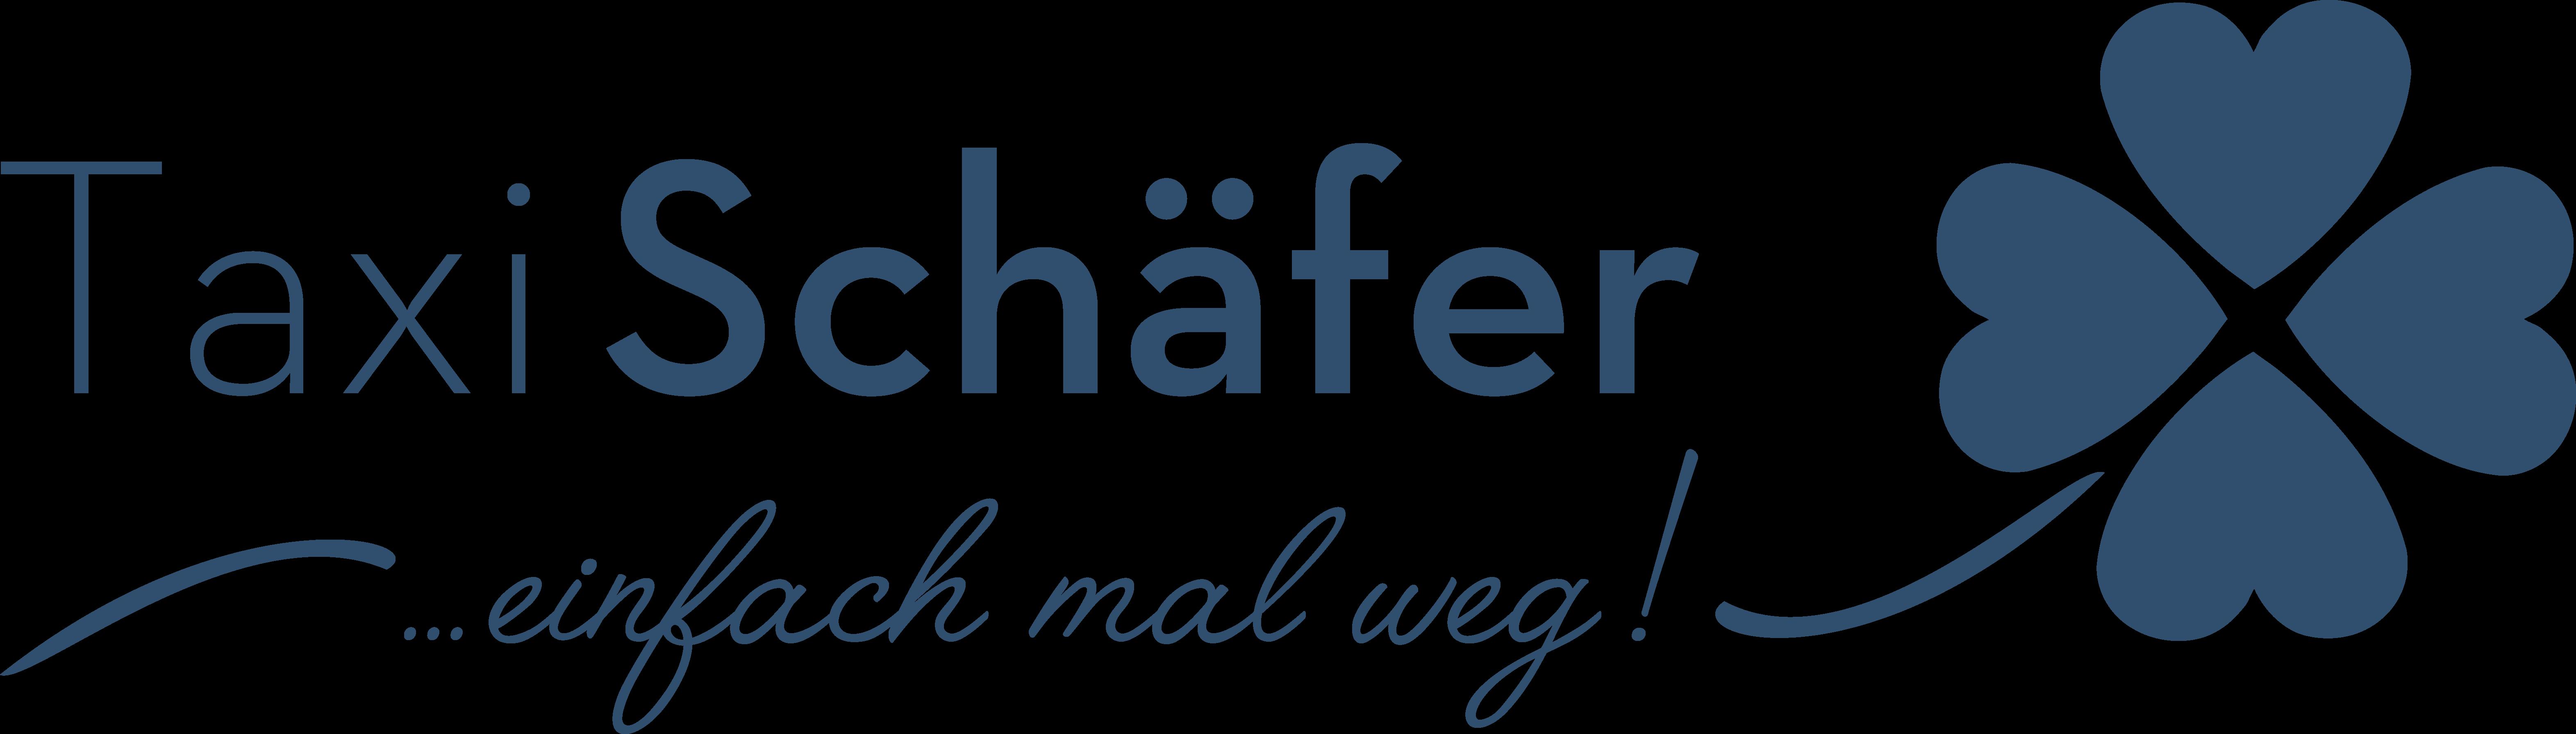 Taxi Schäfer GmbH & Co. KG